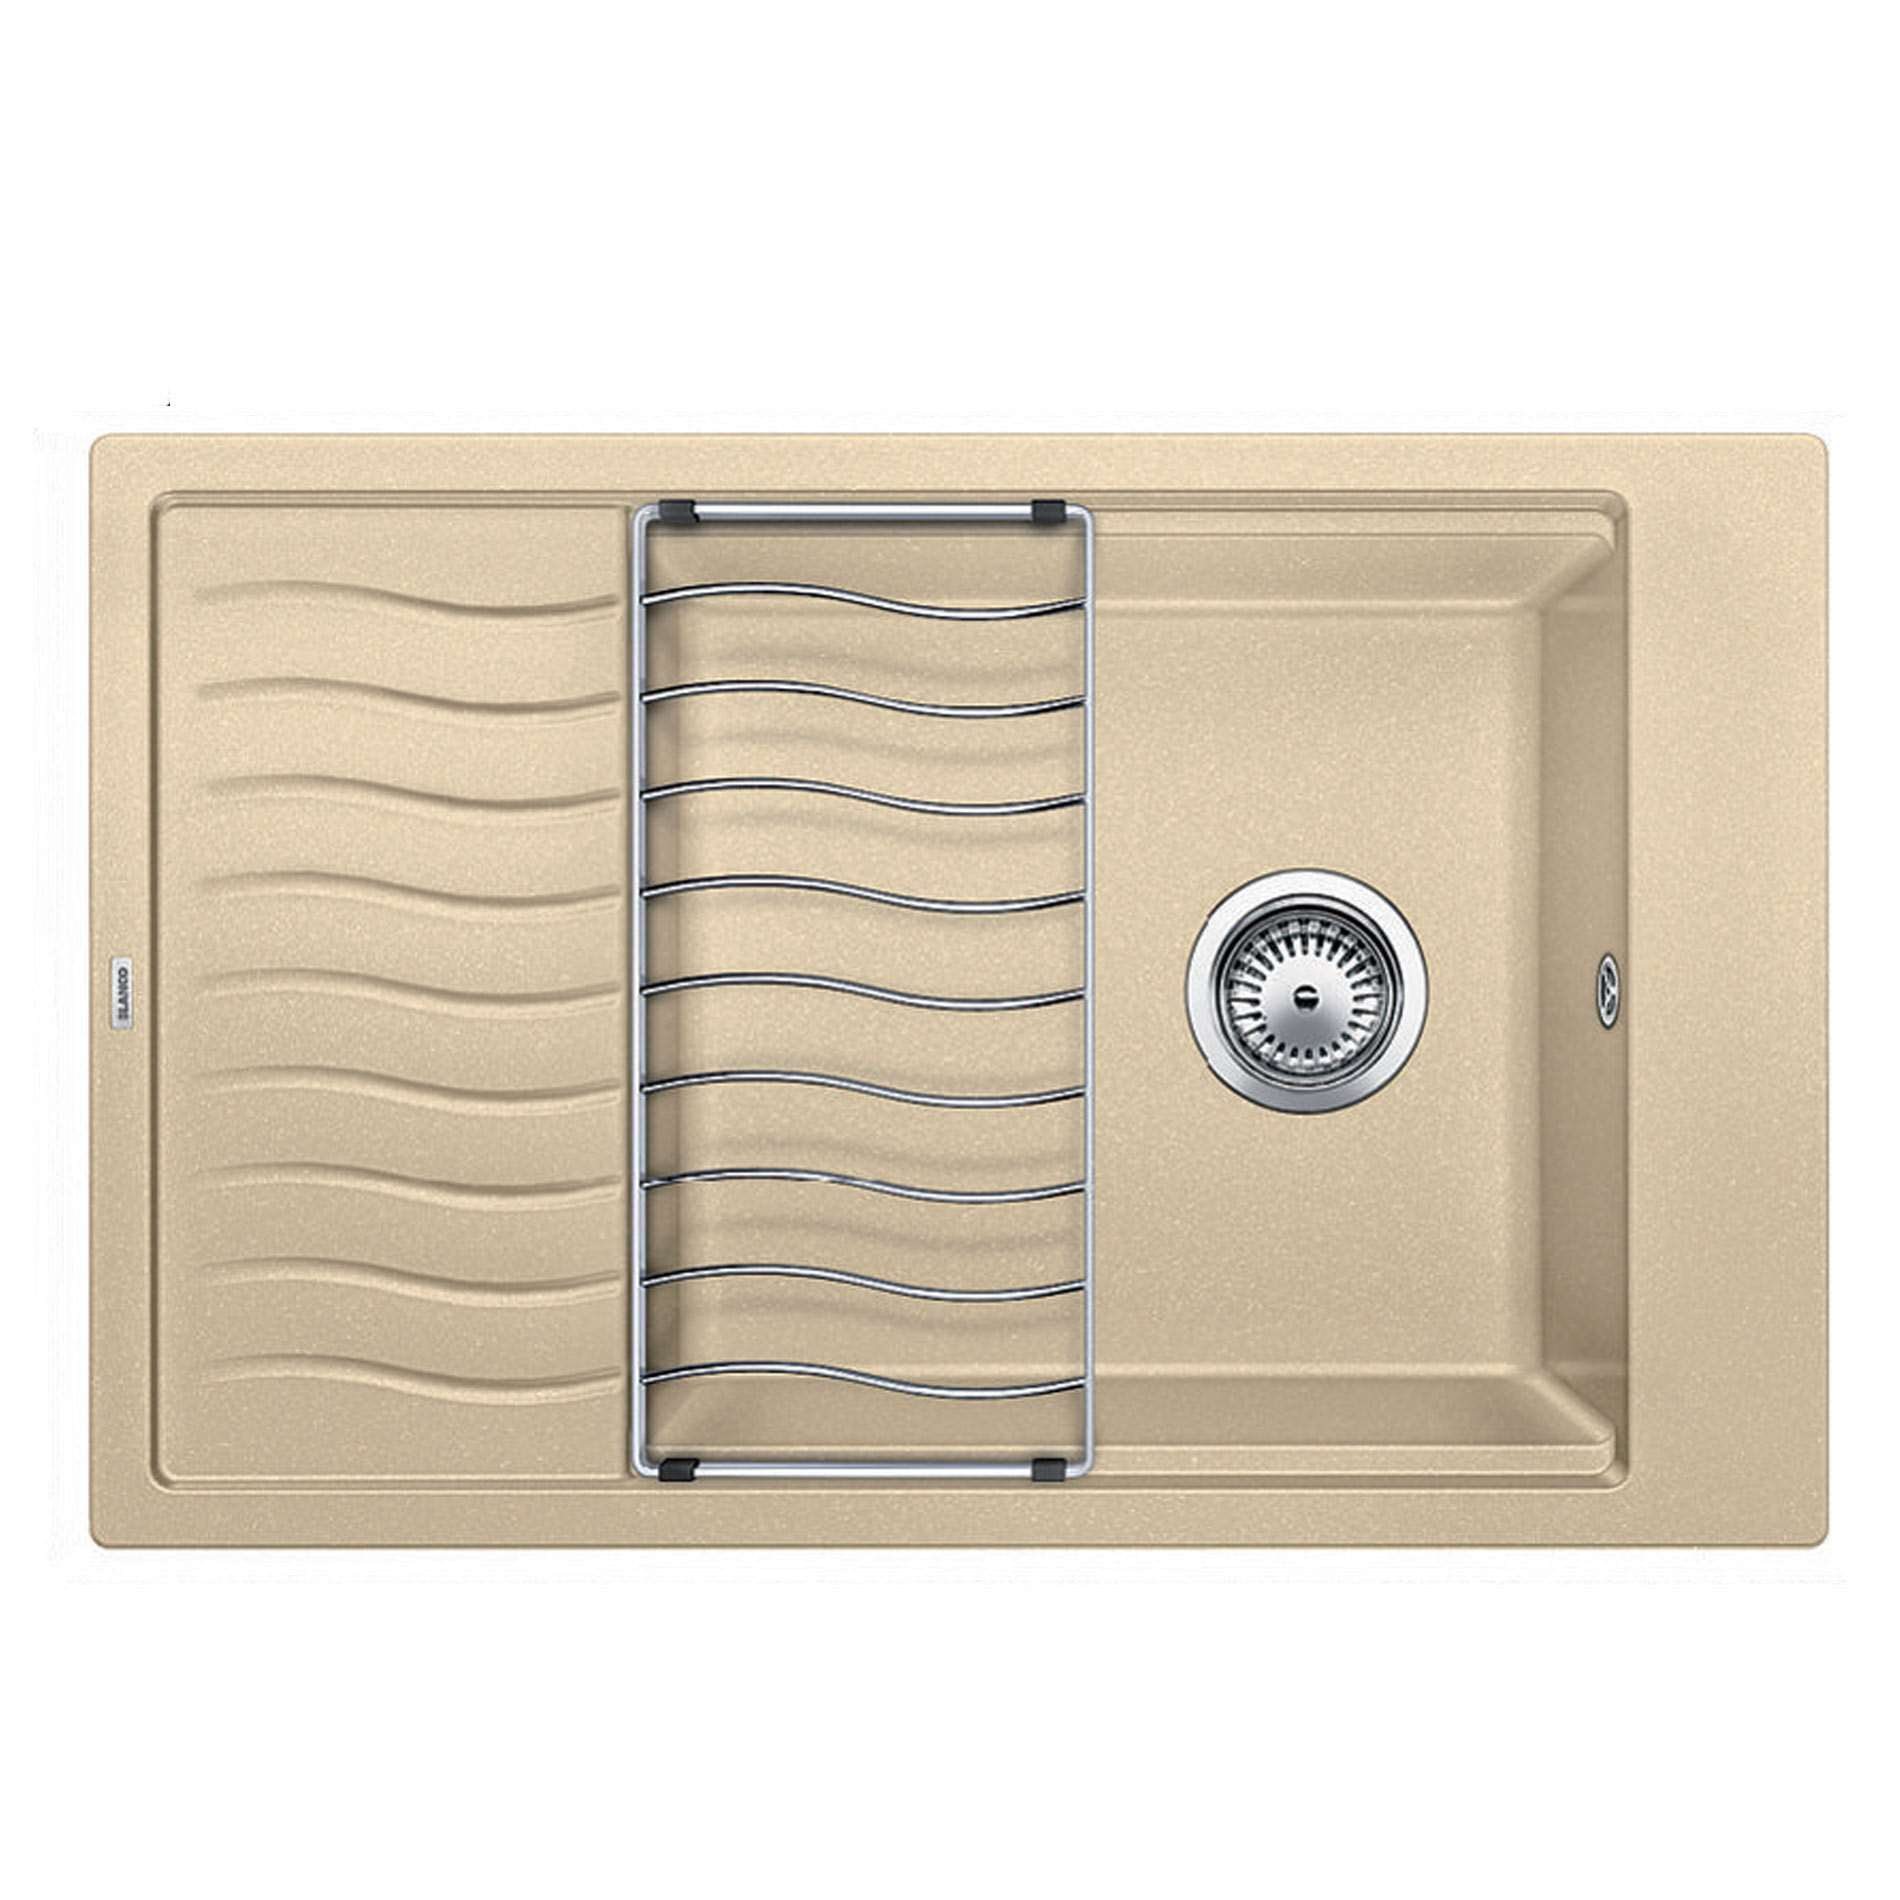 An image of Blanco Inset Silgranit Kitchen Sink ELON XL 6 S CHAMPAGNE